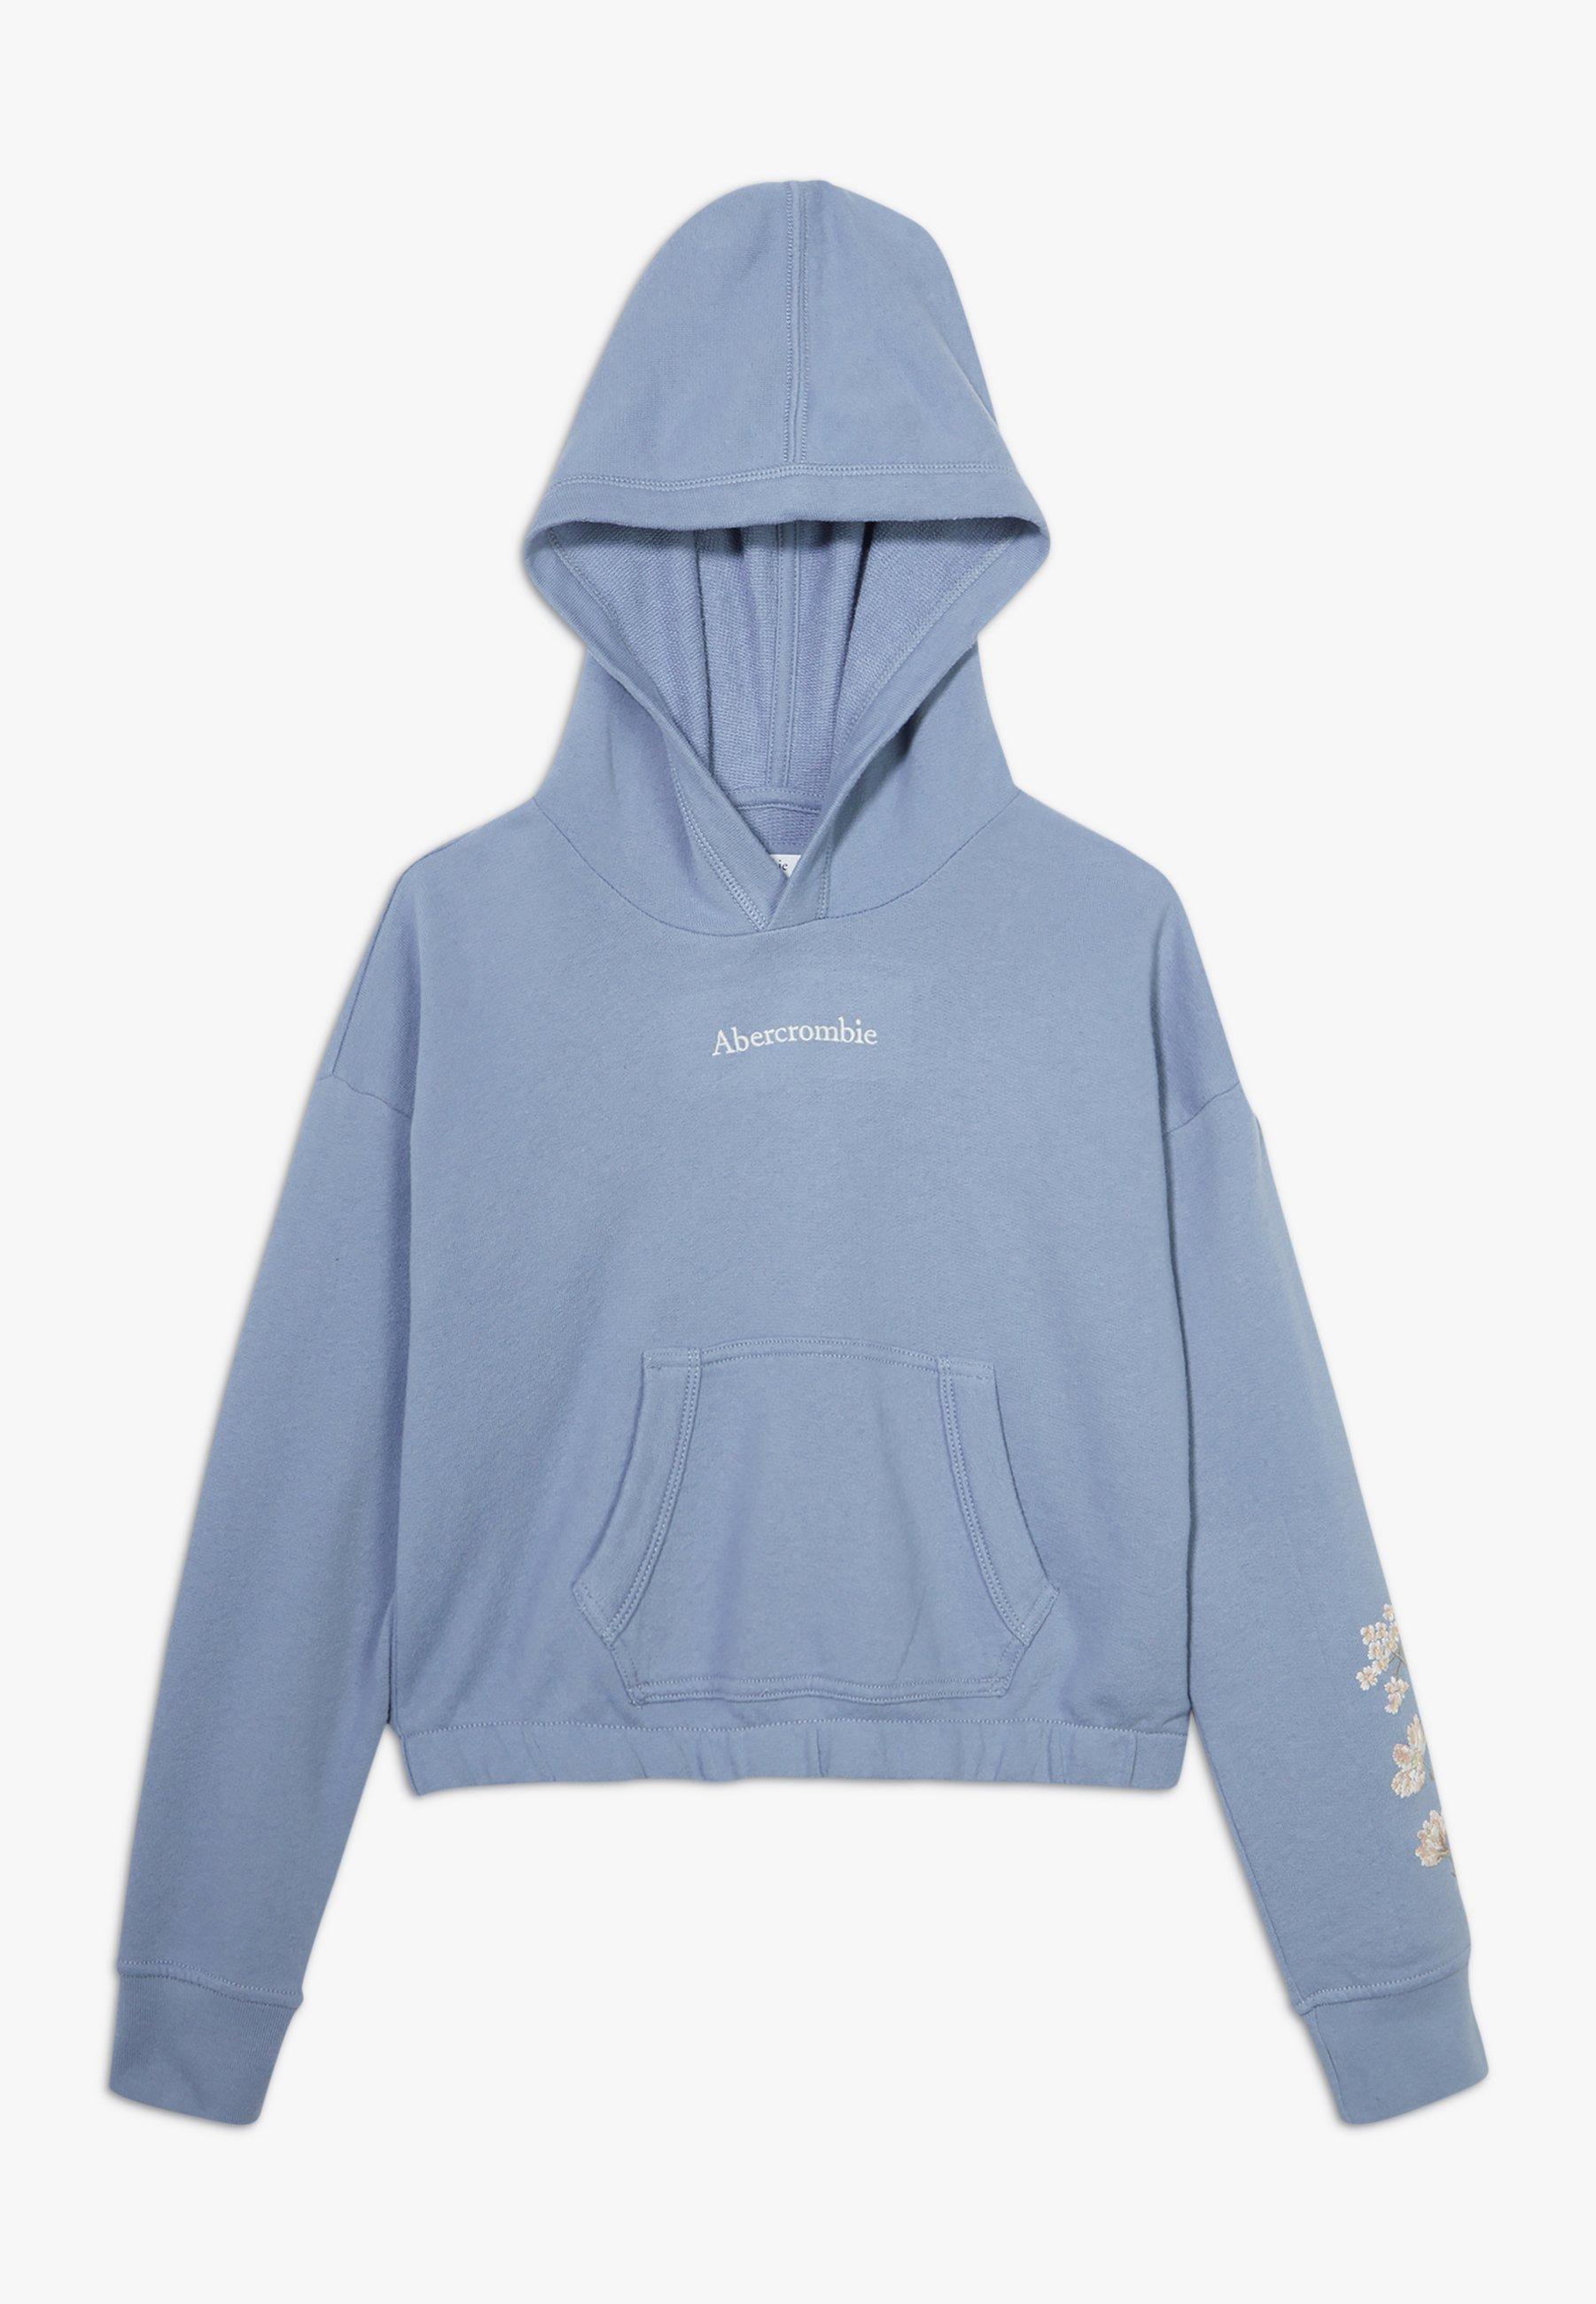 Große Förderung Abercrombie & Fitch HOOD - Sweatshirt - blue | Damenbekleidung 2020